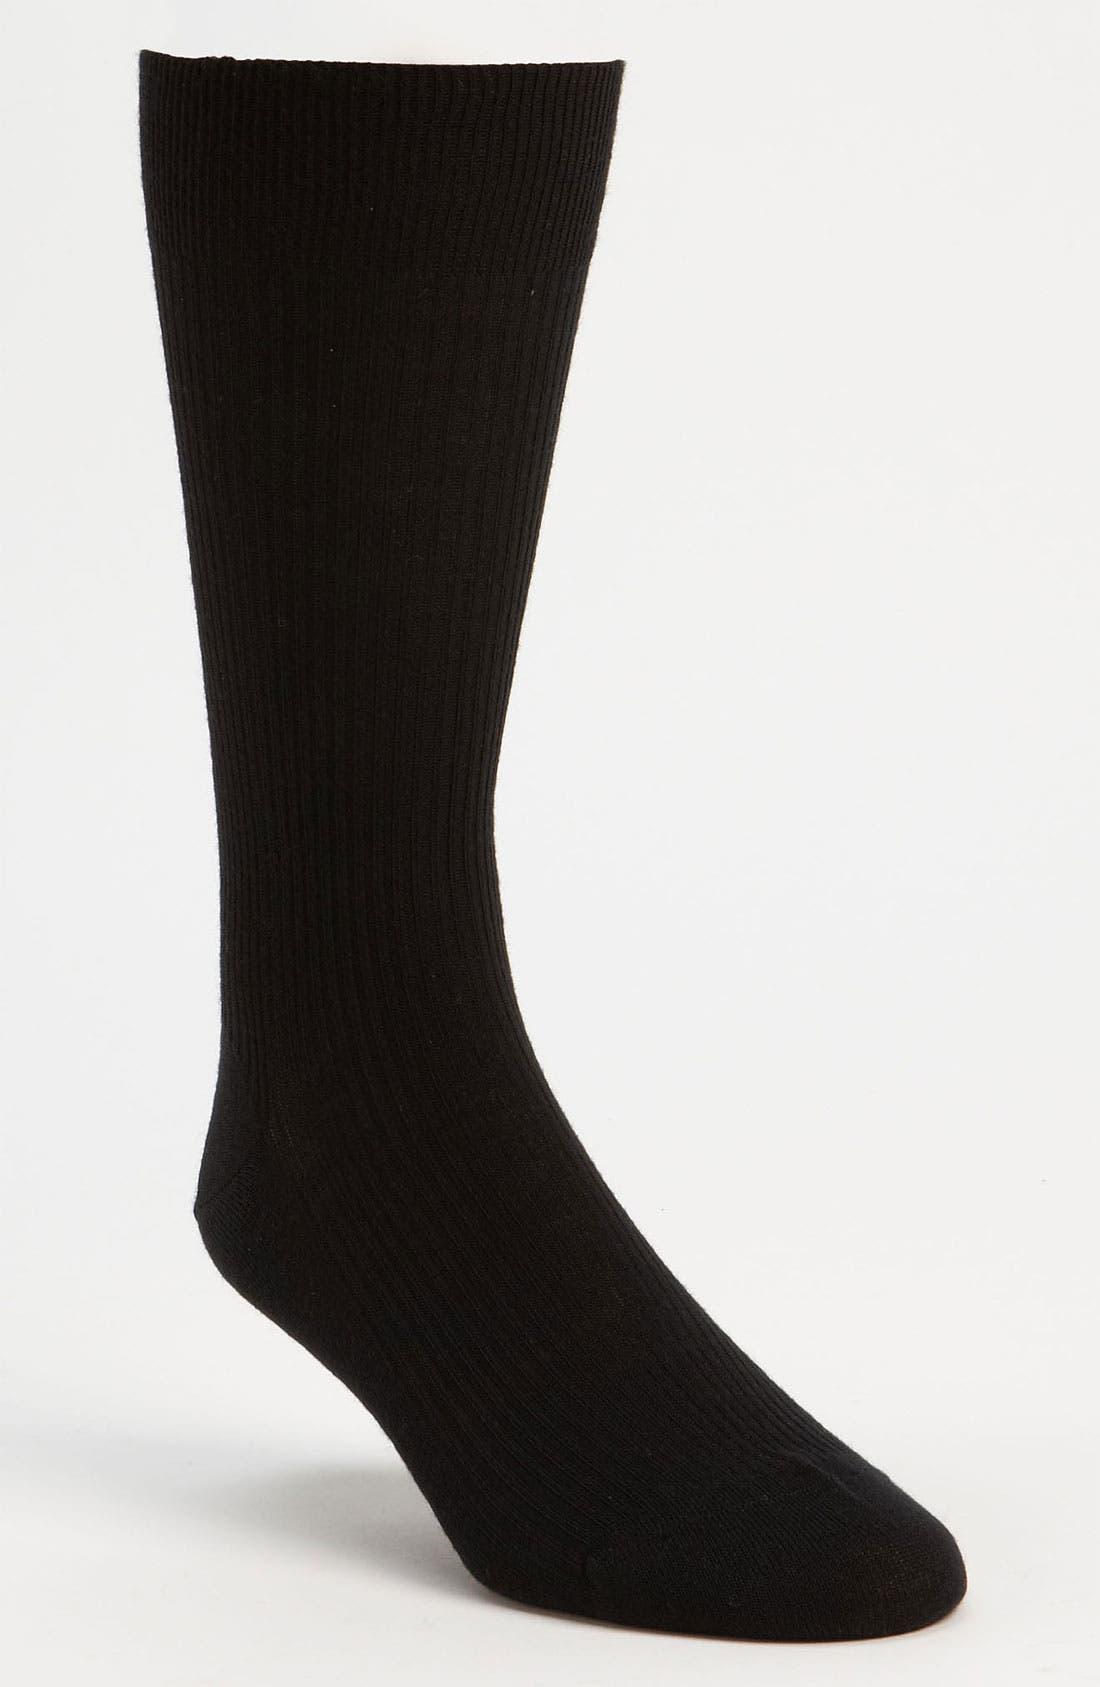 Main Image - Pantherella Merino Wool Mid Calf Dress Socks